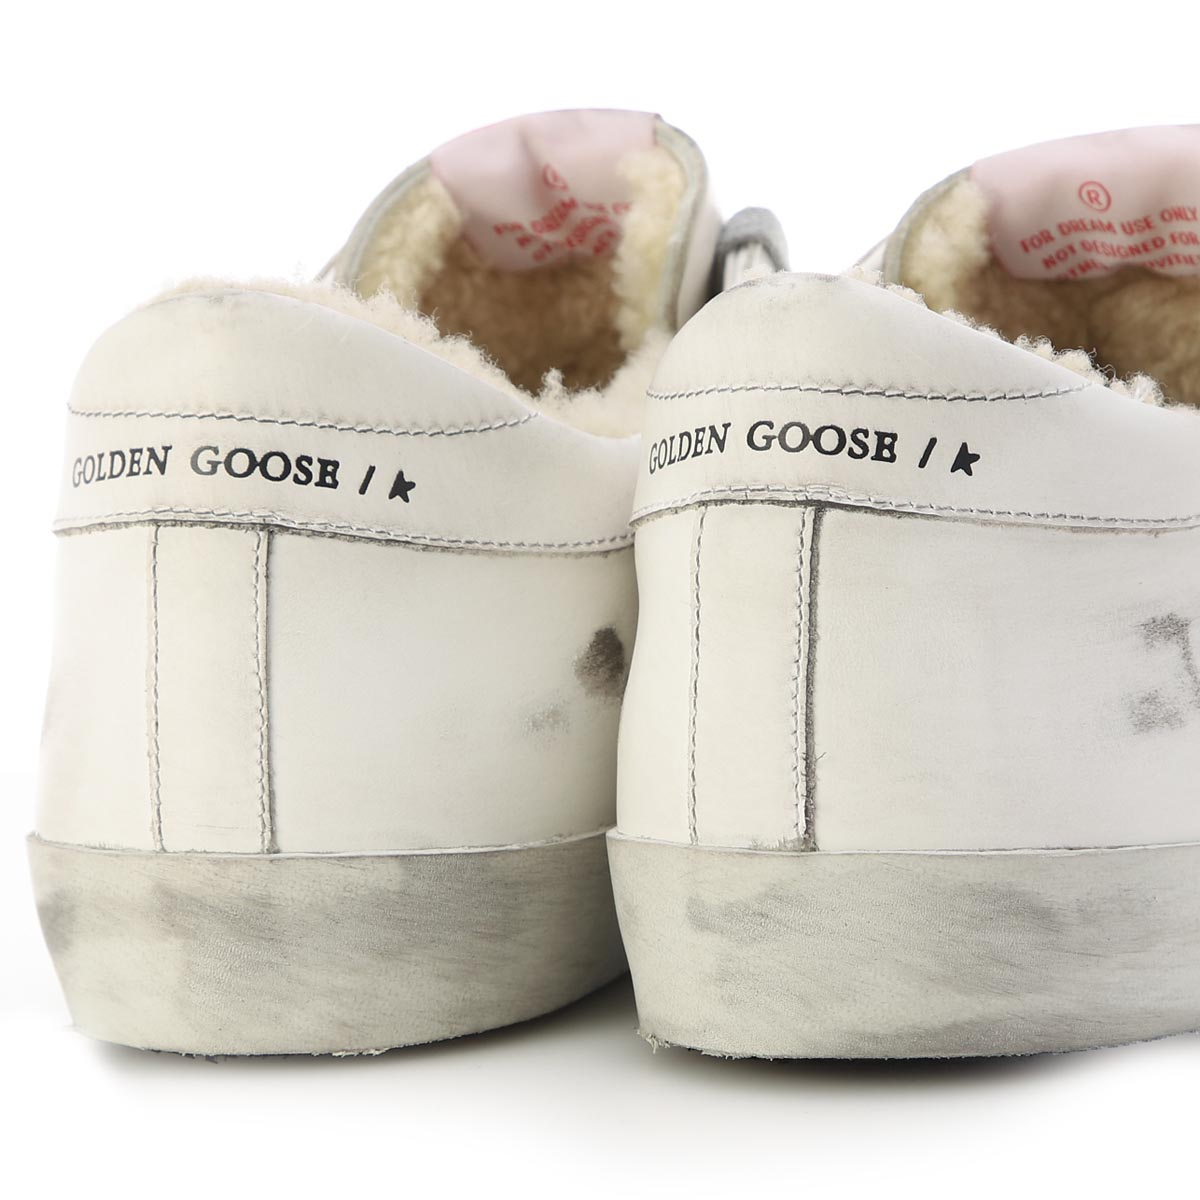 Golden Goose Deluxe Brand ゴールデングース スニーカー/SUPER-STAR【大きいサイズあり】 メンズ